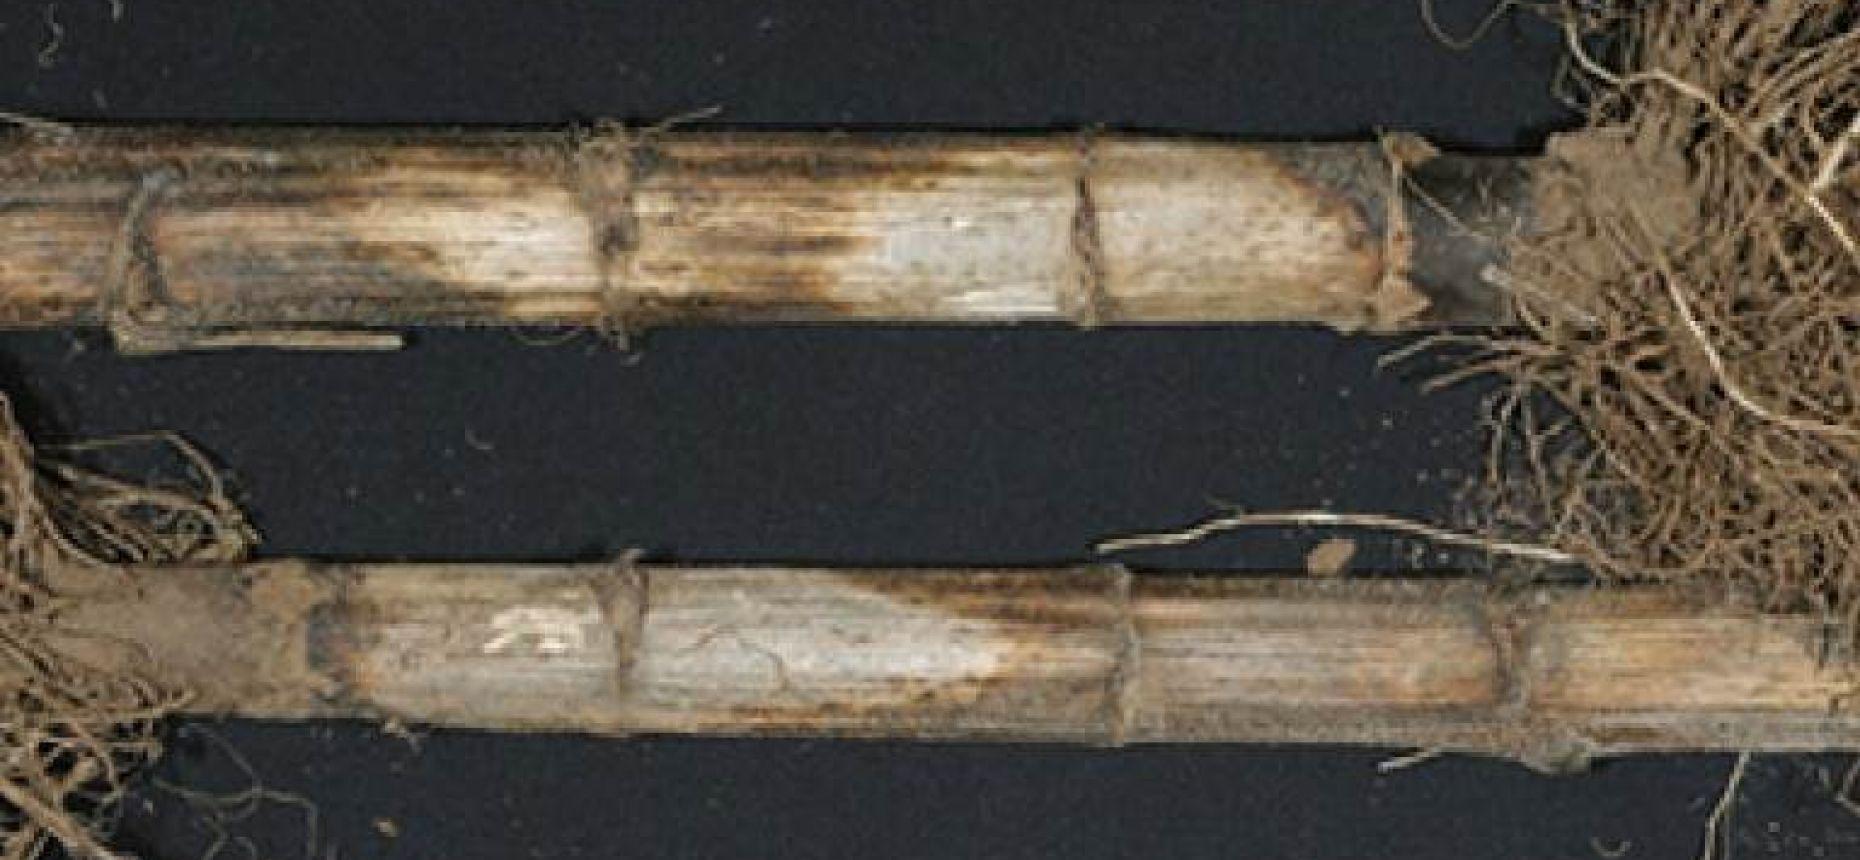 Пепельная гниль подсолнечника - Macrophomina phaseolina (Tassi) Goid.(=Sclerotium bataticolaTaubenh.)